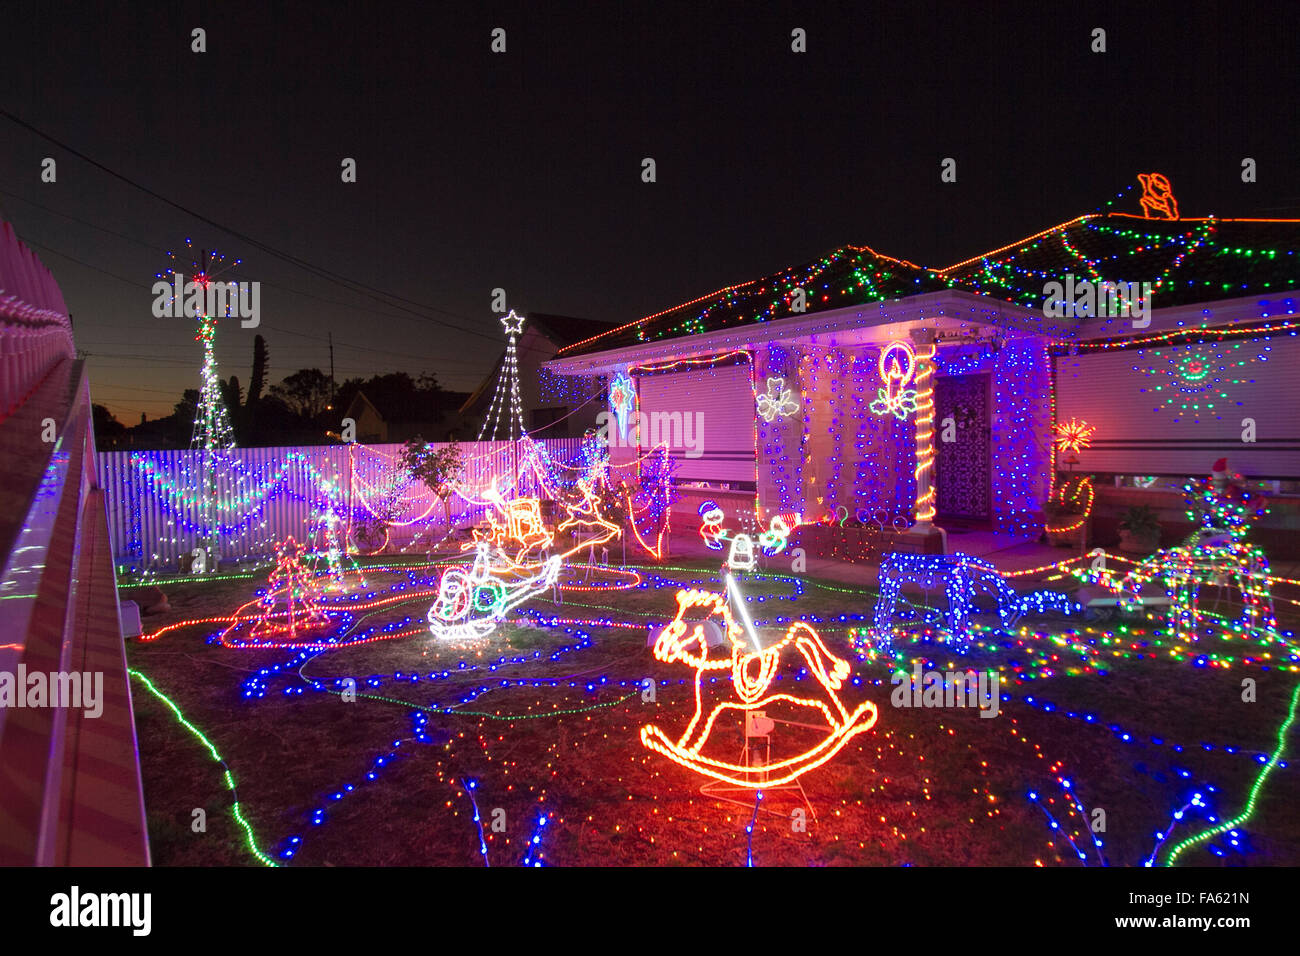 Christmas Decorations Adelaide Australia Stock Photos ...